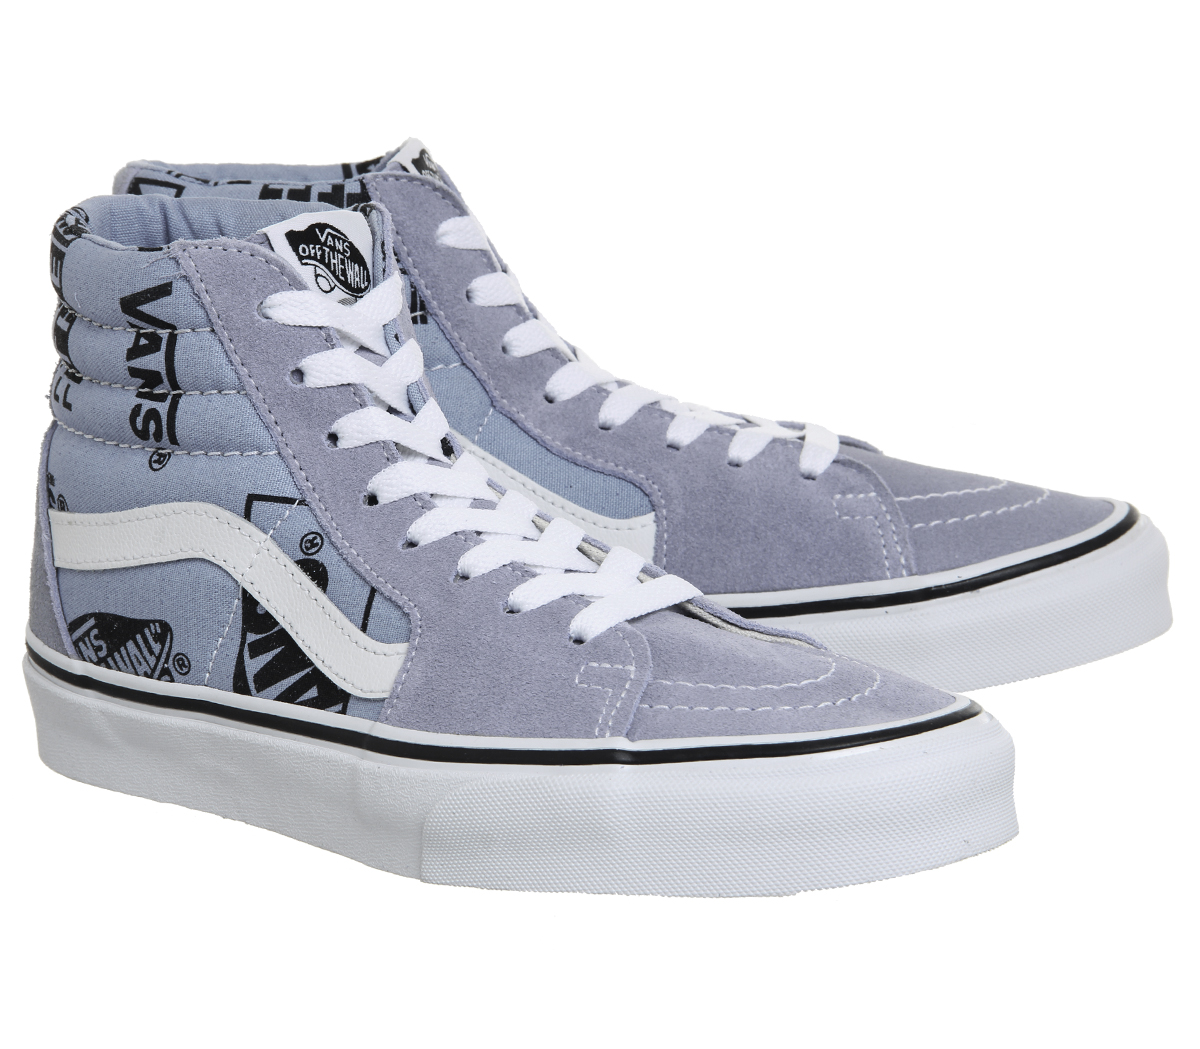 SENTINEL VANS Sk8 Ciao formatori LUSTRE lavanda LOGO scarpe da ginnastica  scarpe nero e25275d8c3d